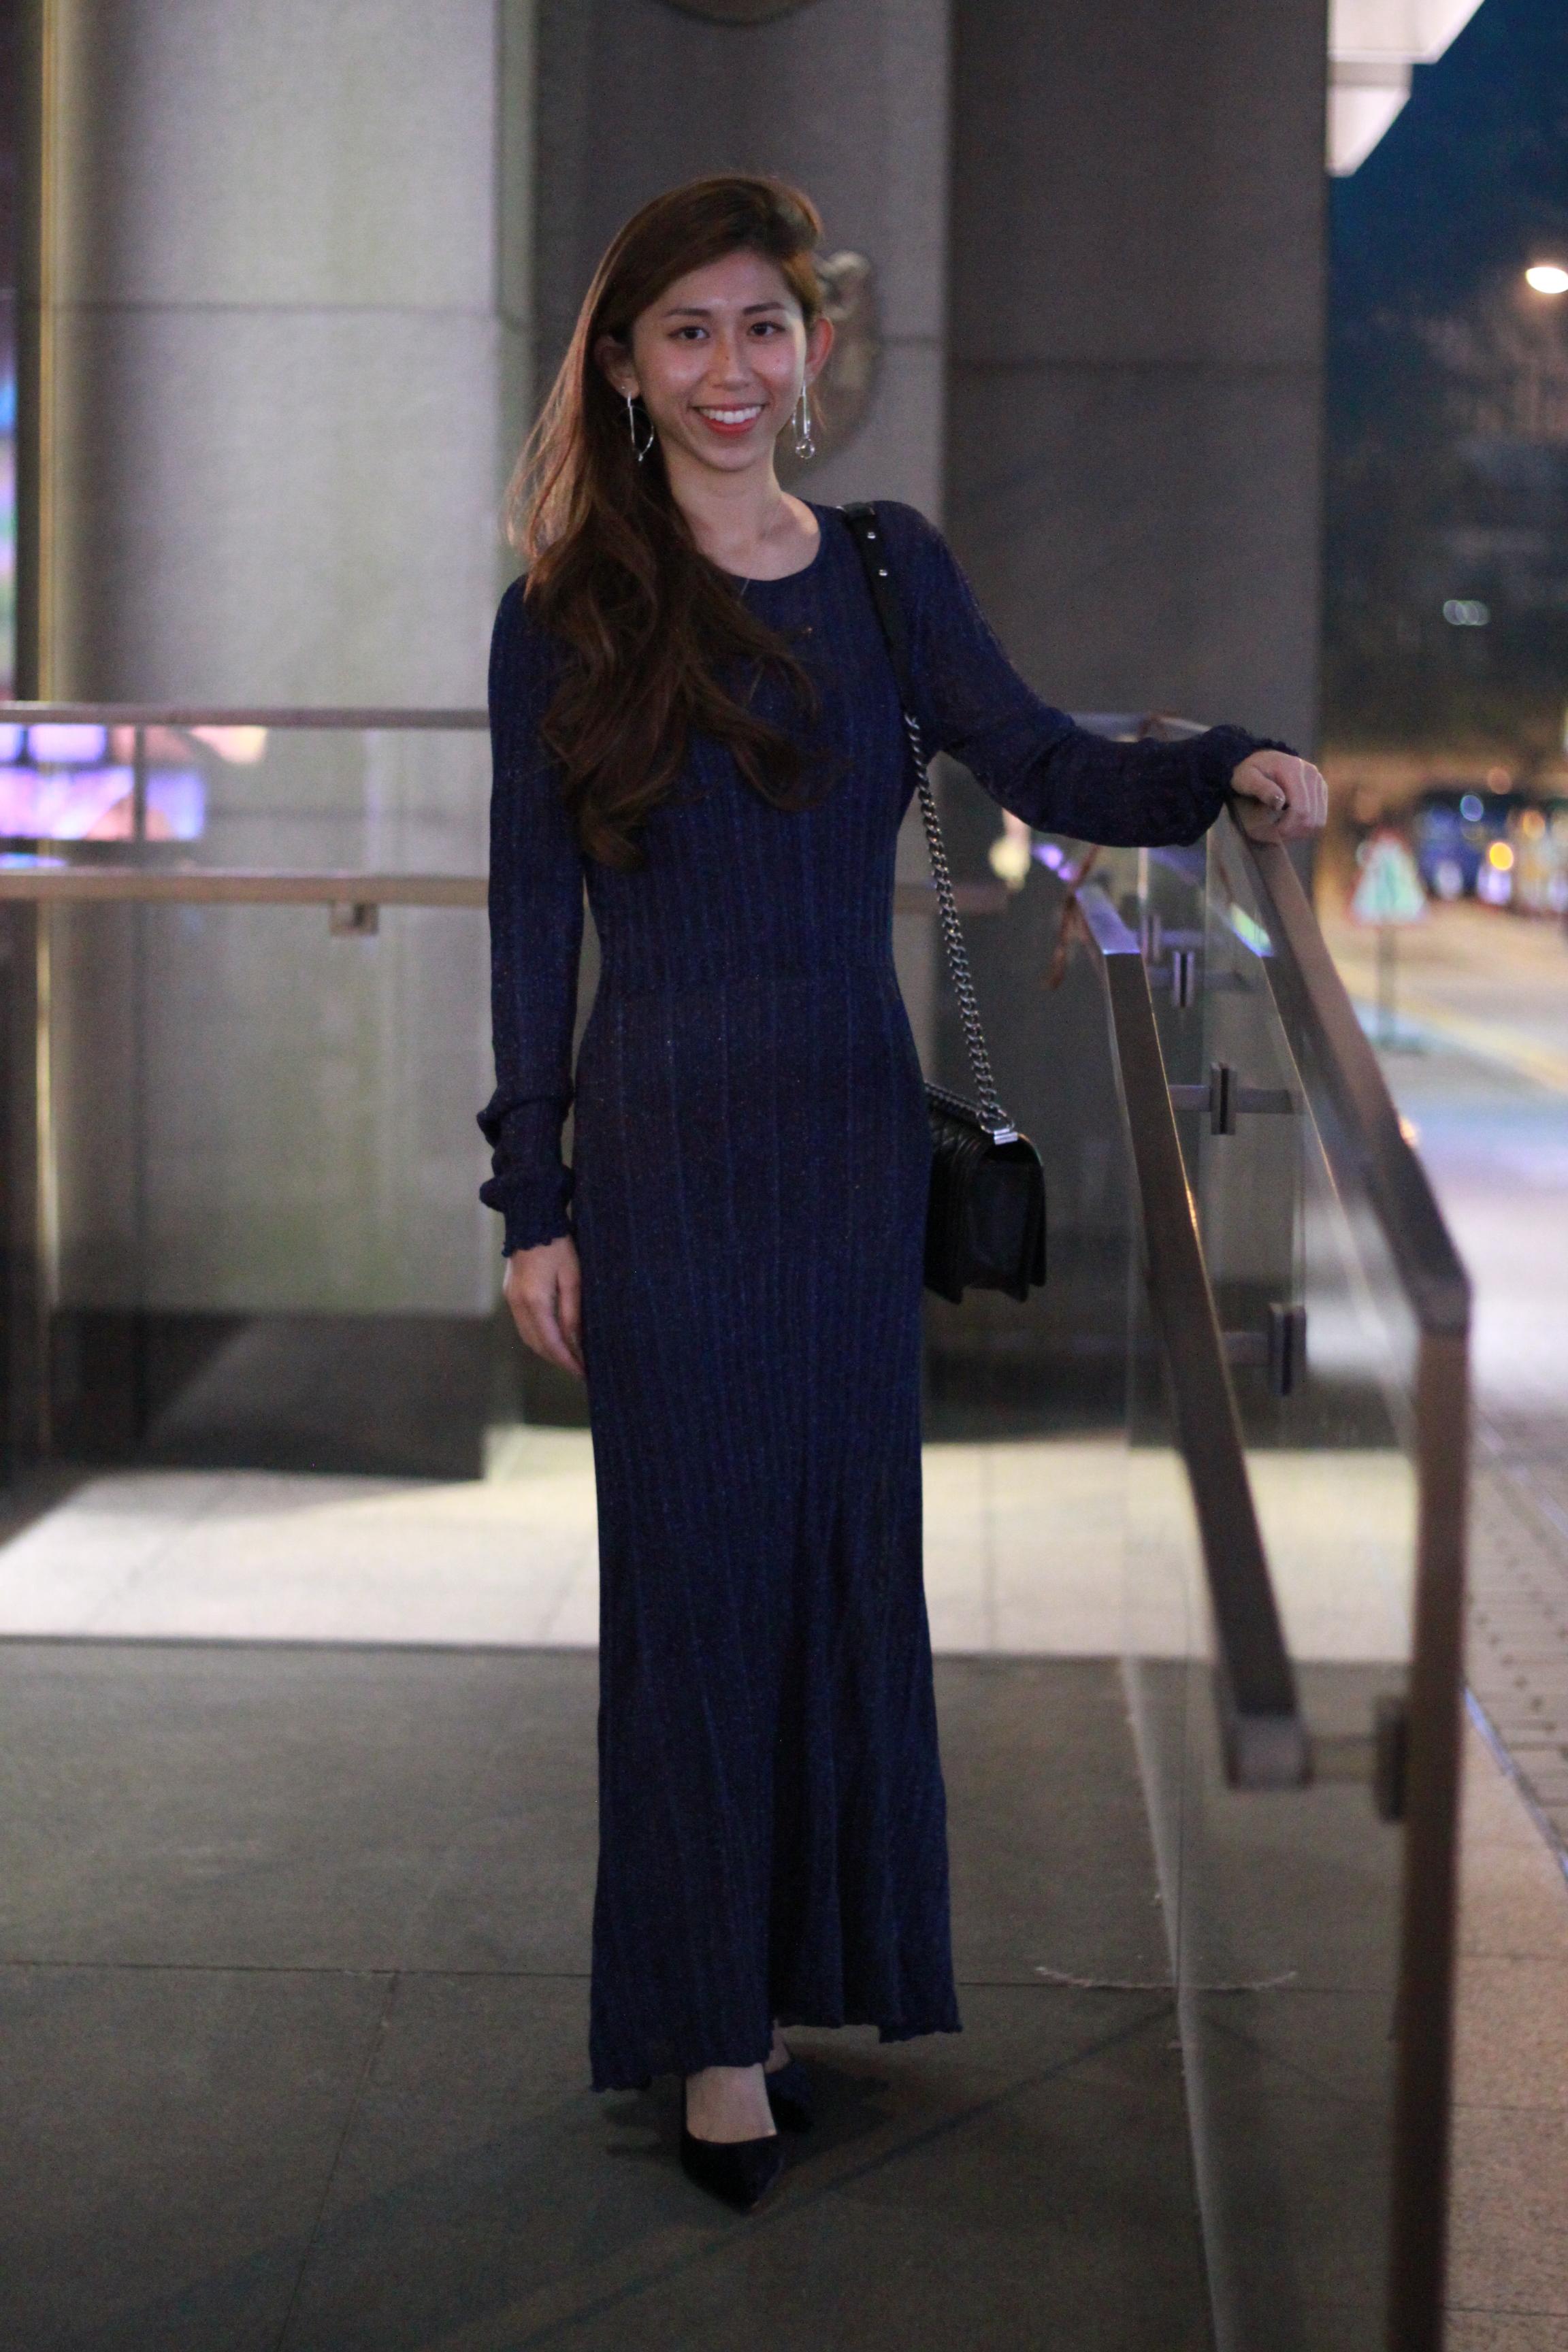 Zara maxi dress / Prada velvet pumps / Chanel boy bag / Emoda earrings